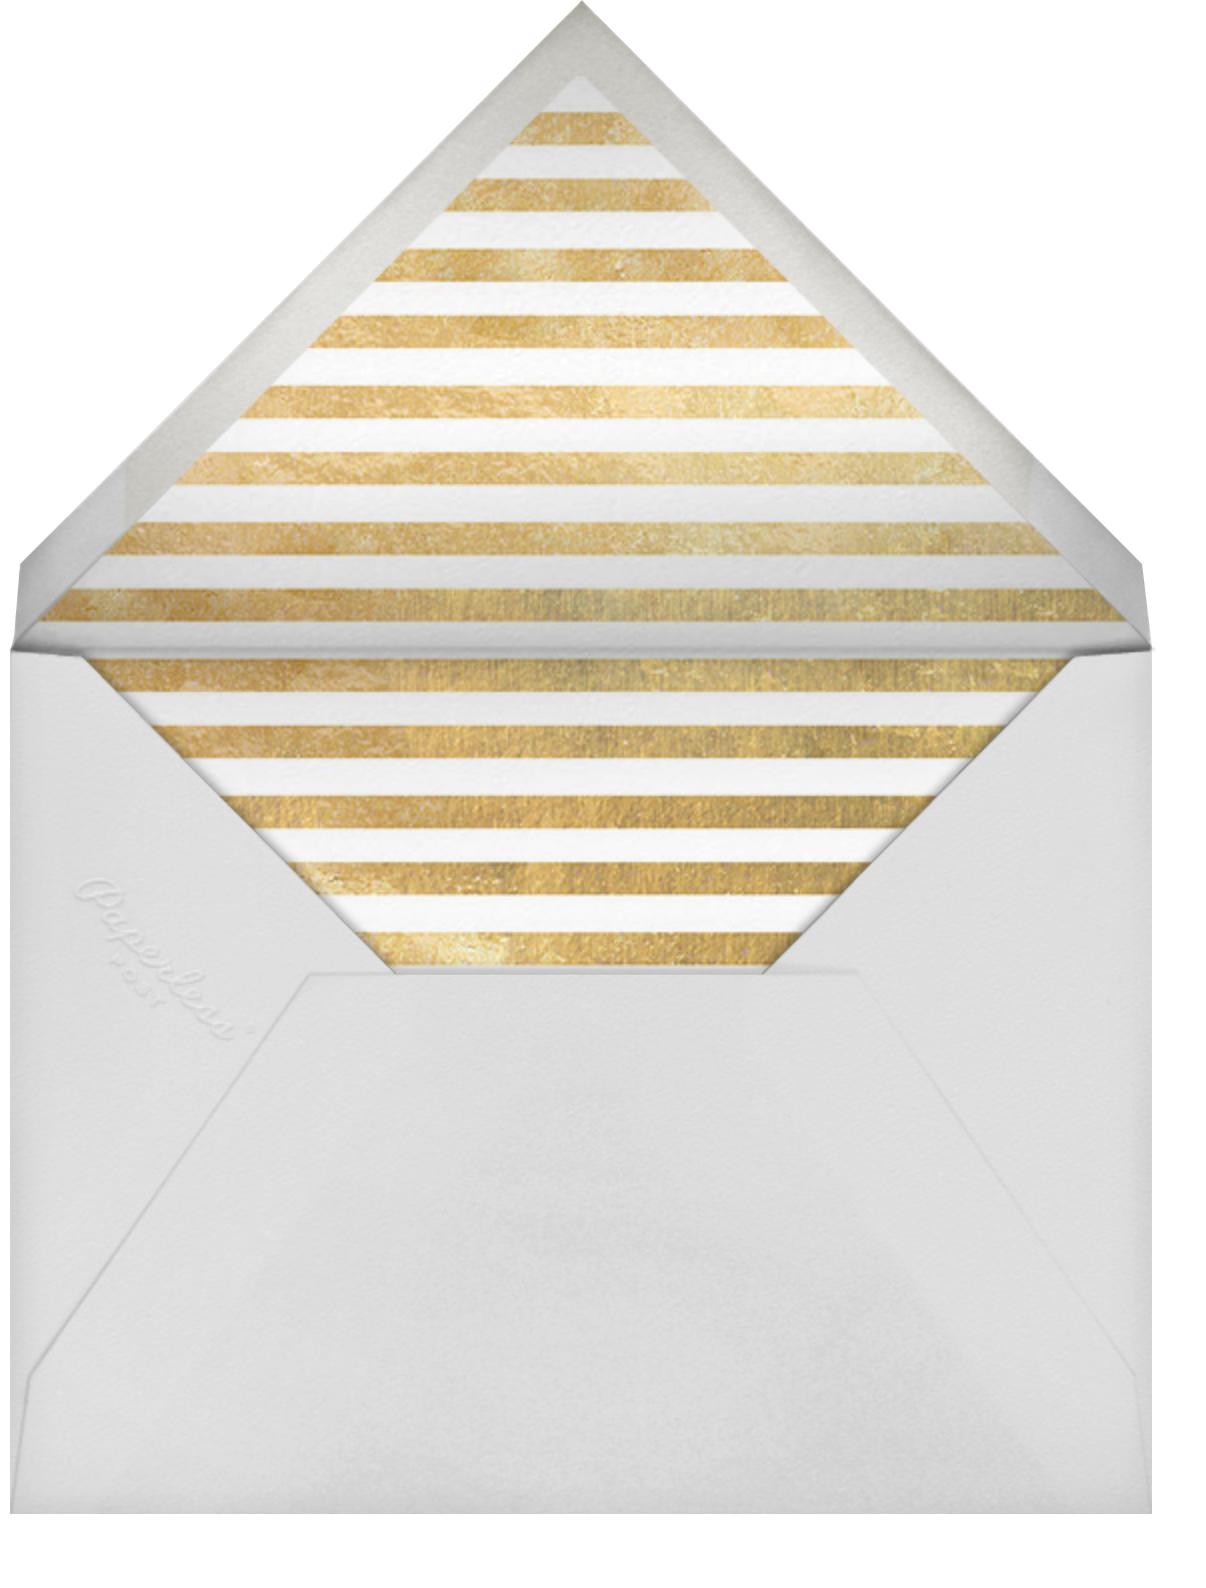 Rose Bed Frame - kate spade new york - All - envelope back